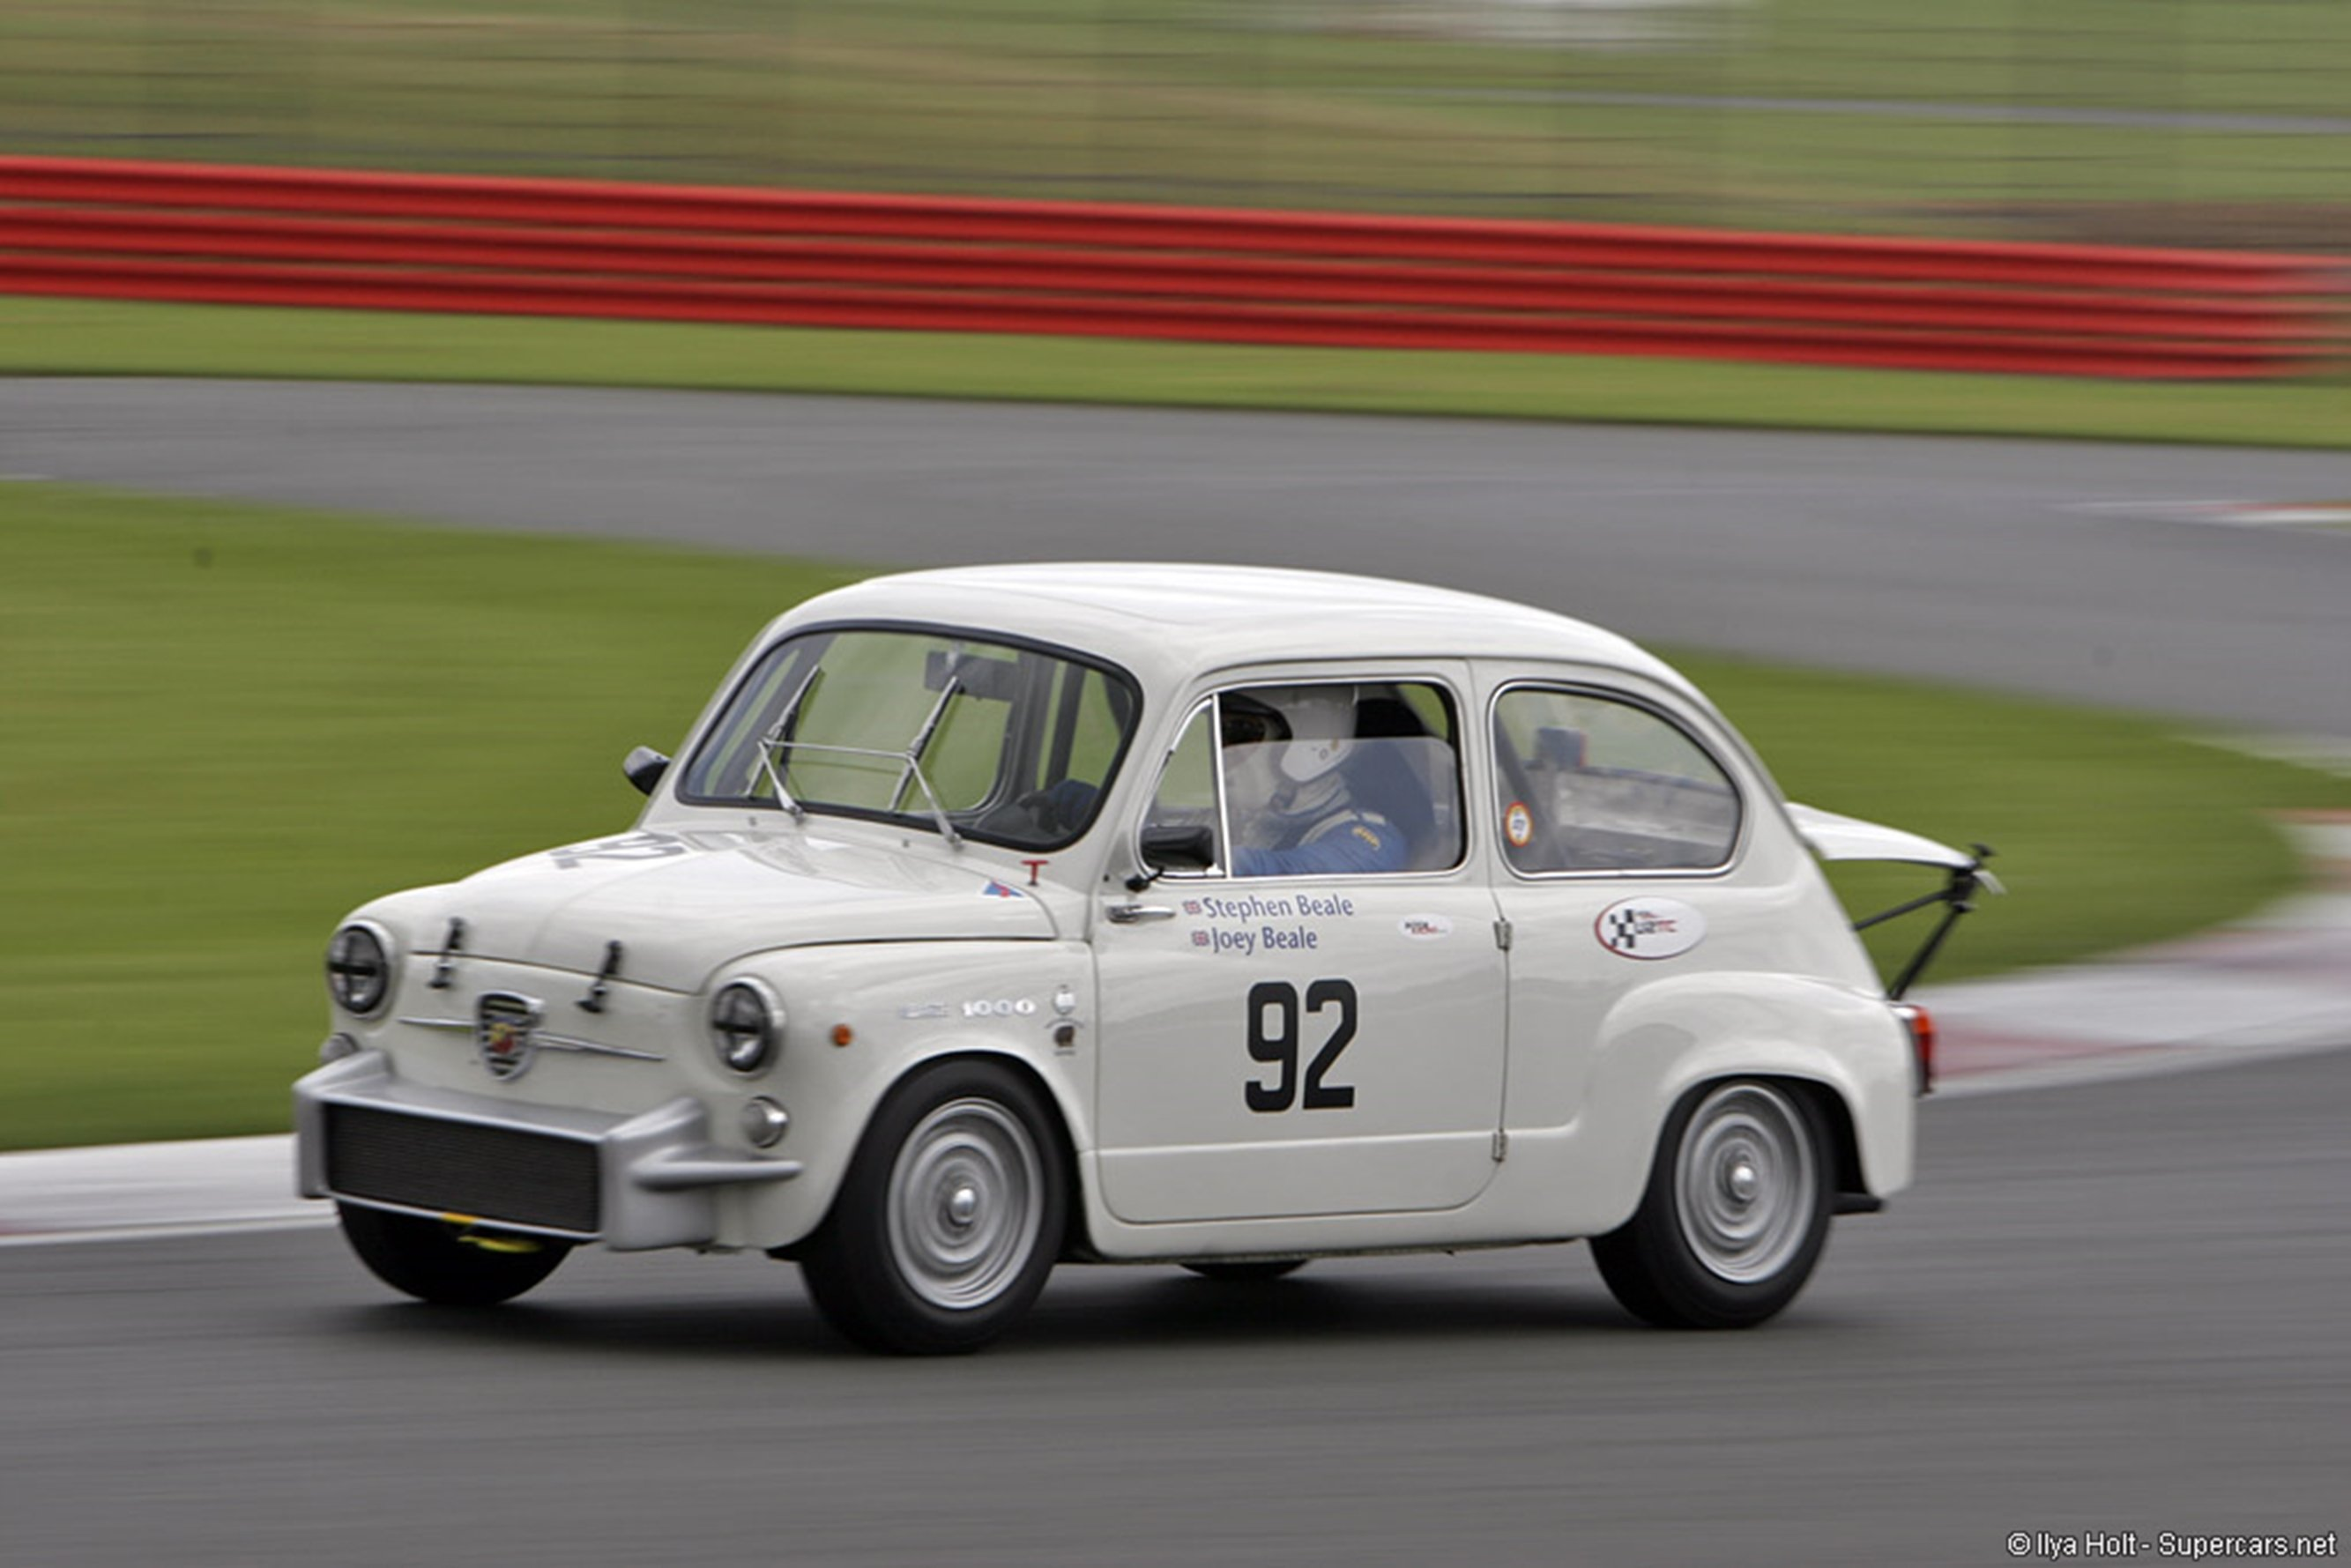 Fiat Classic Car Racing 500 Abarth Wallpaper 2667x1779